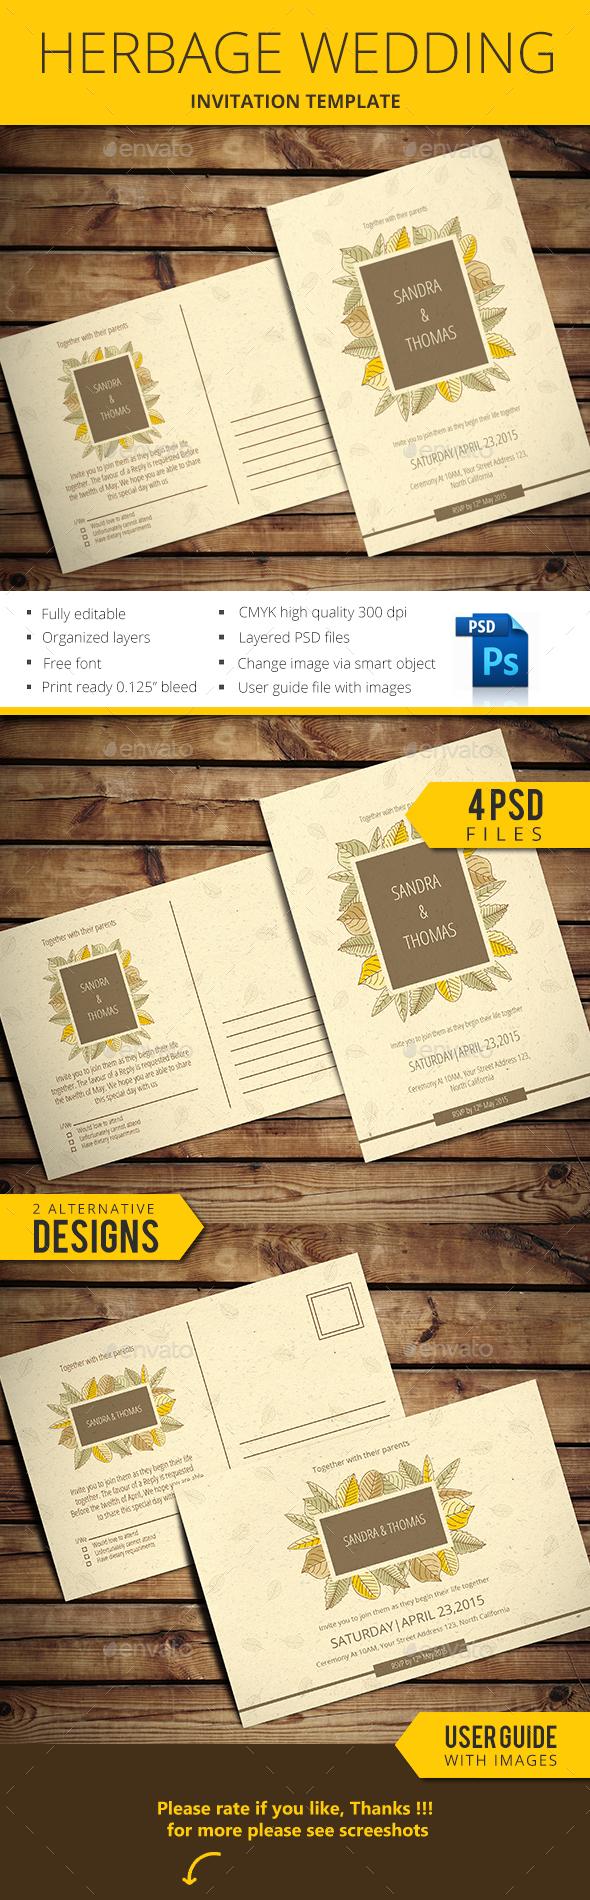 Herbage Wedding Invitation - Weddings Cards & Invites